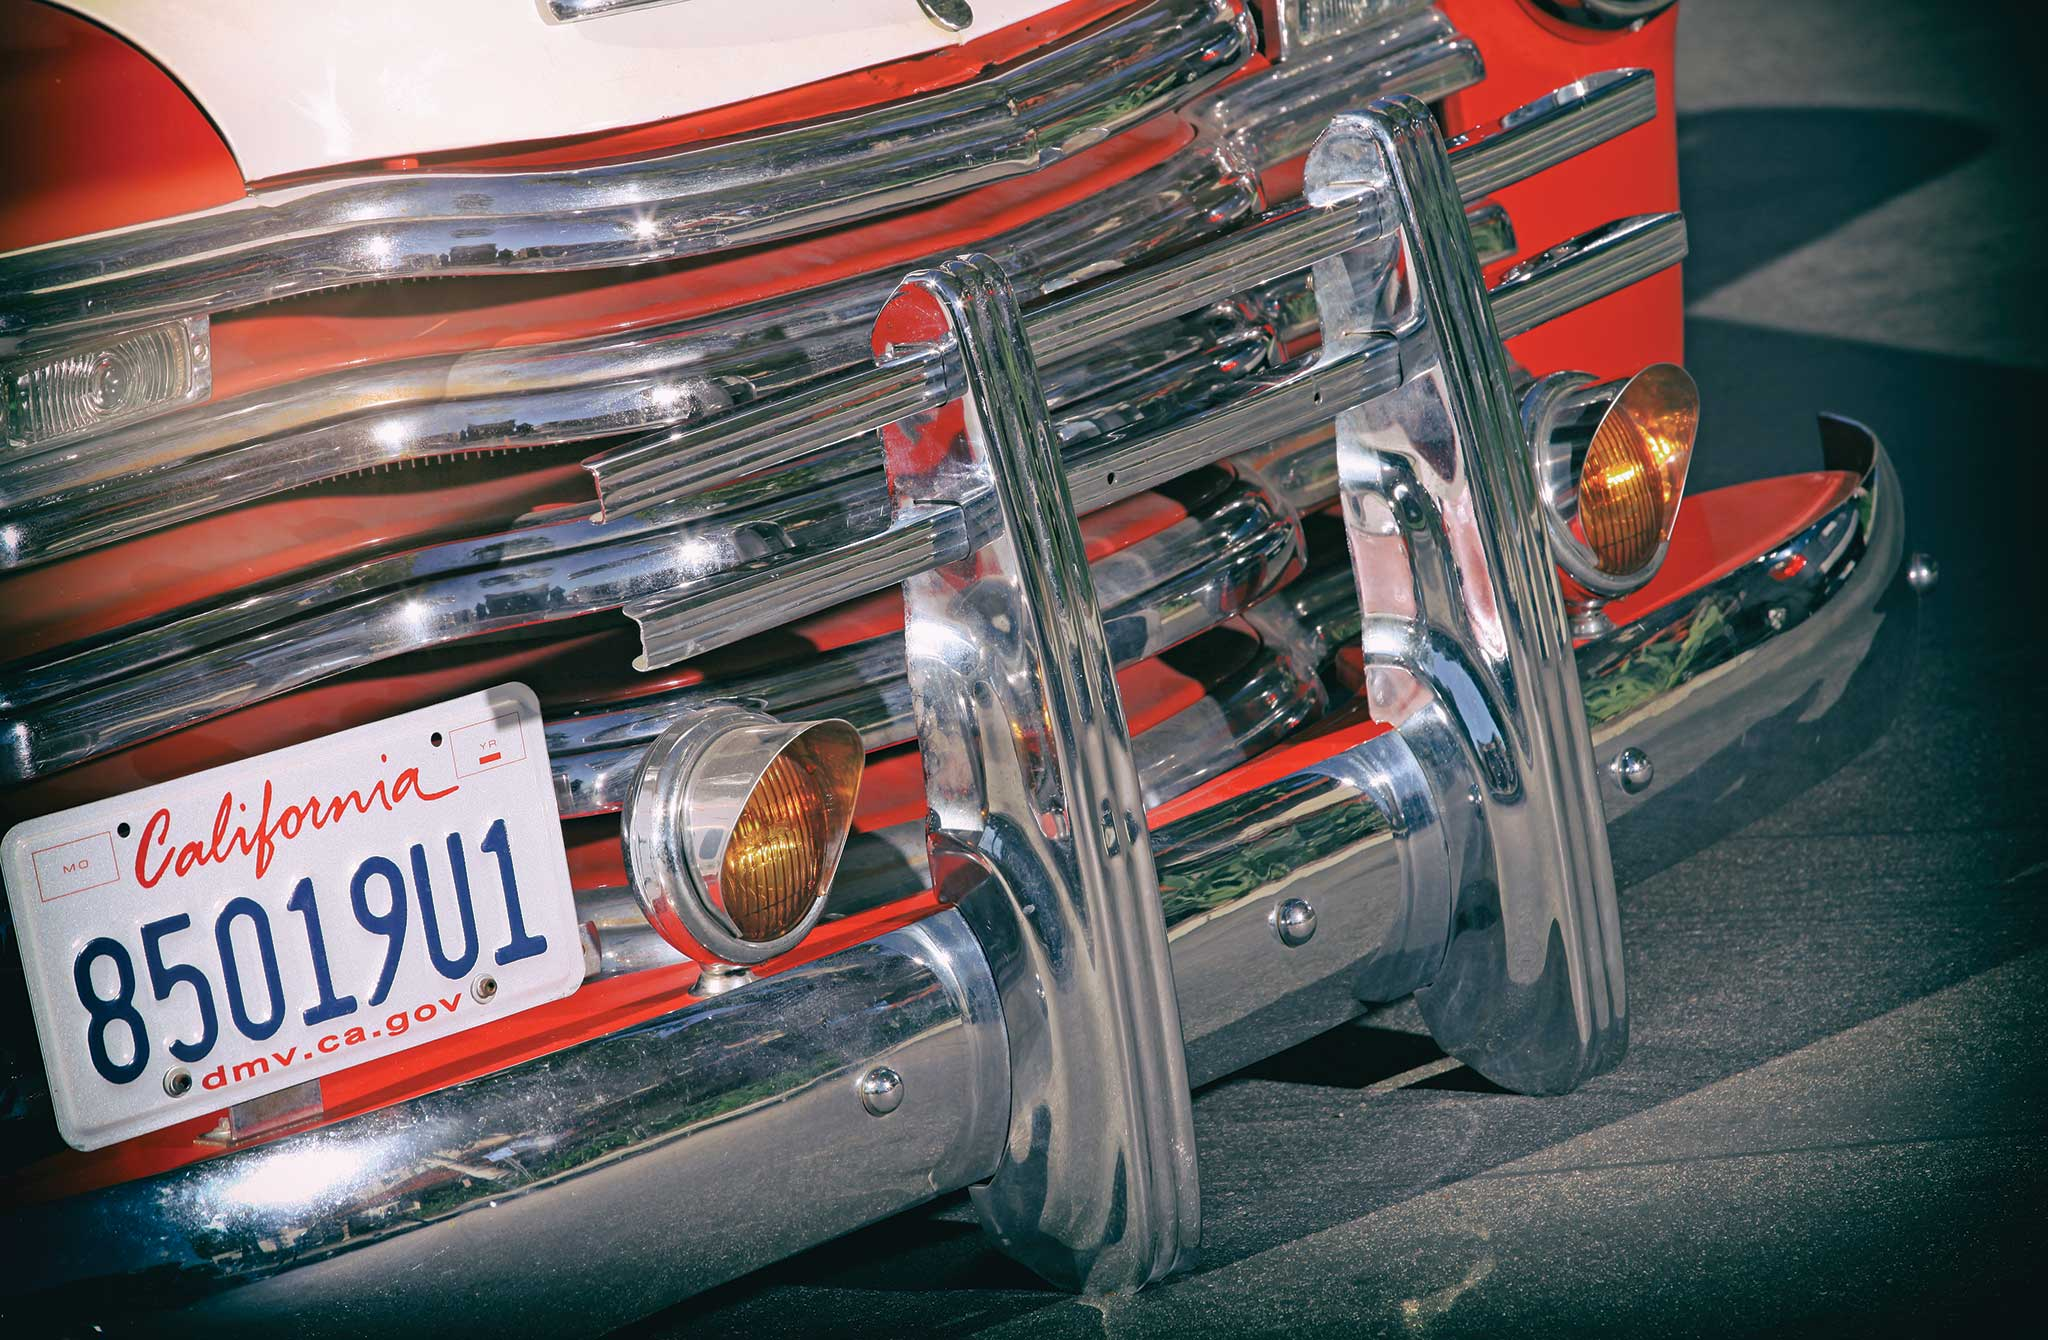 004 1951 chevrolet 3100 front bumper